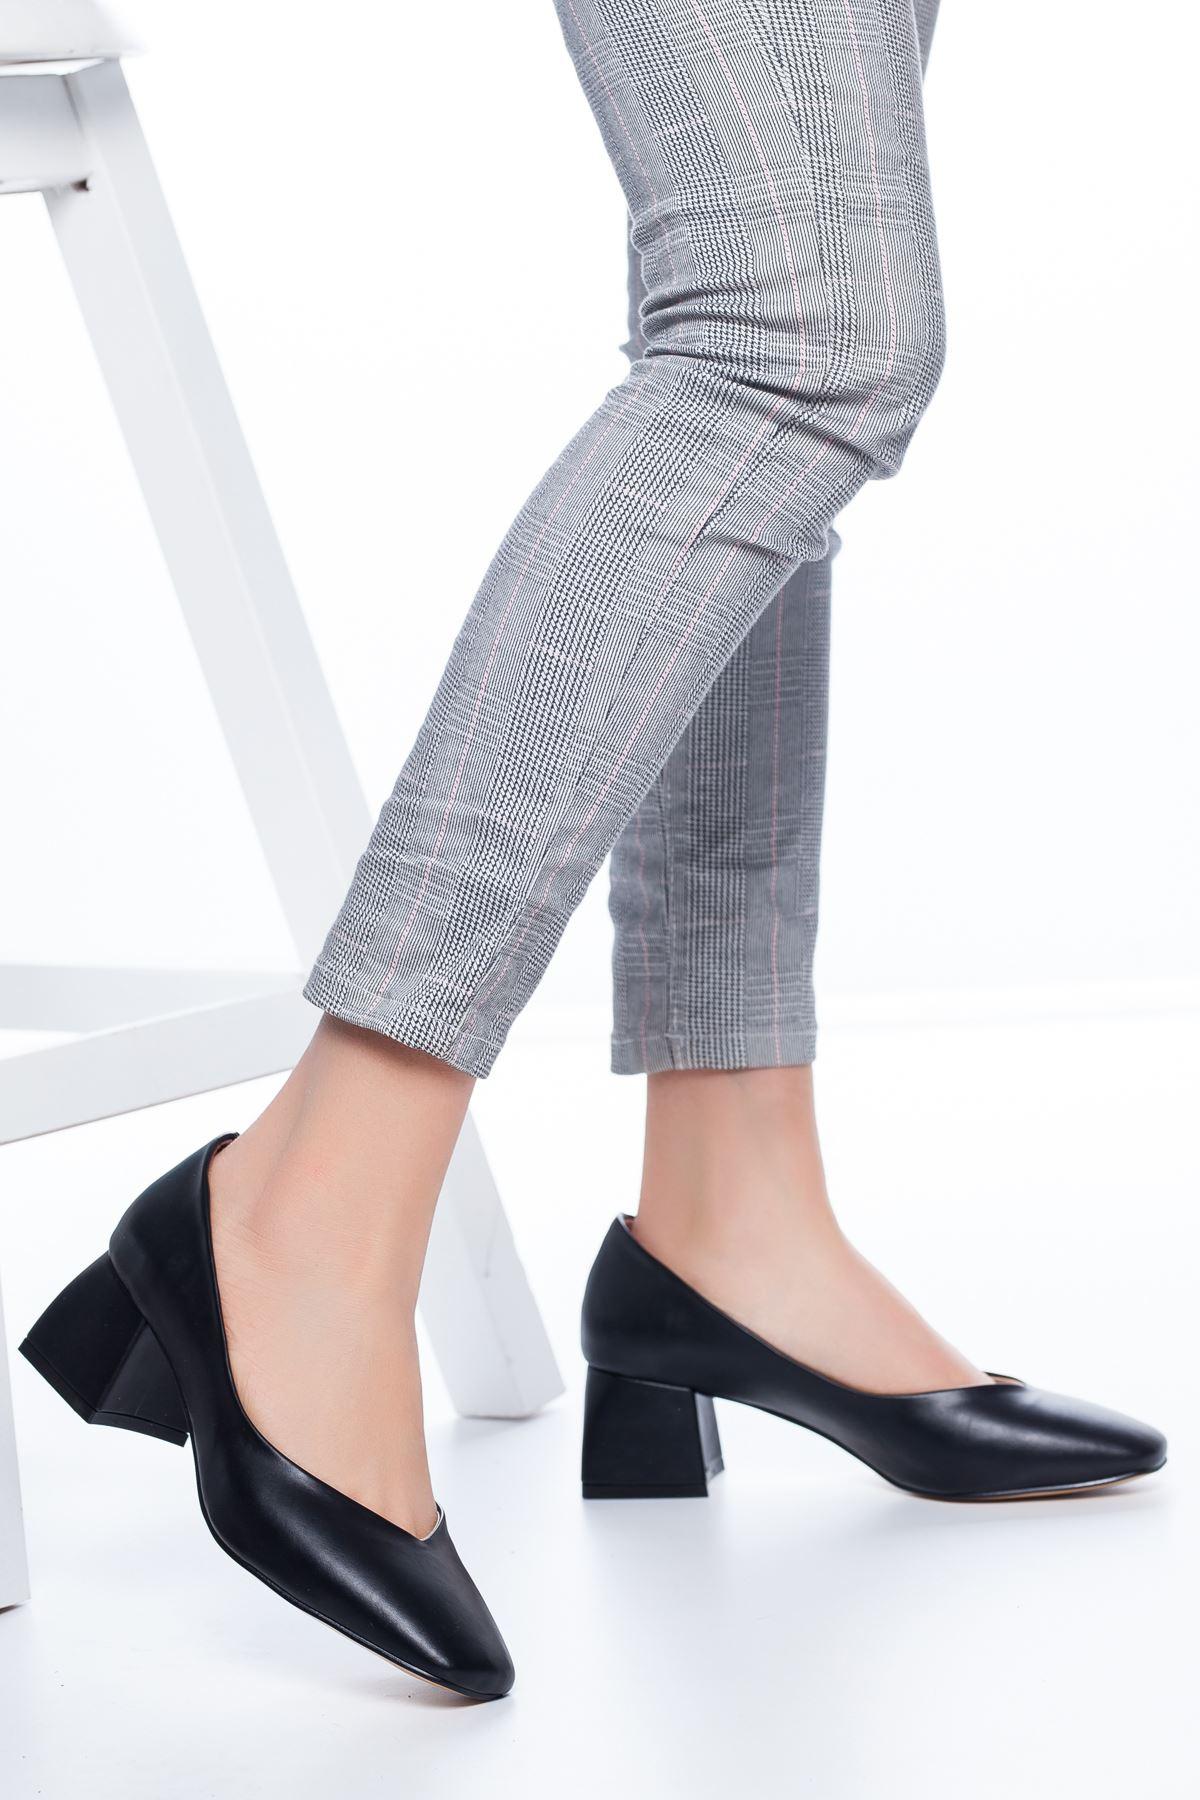 Adela Küt Burun Topuklu Cilt Ayakkabı Siyah